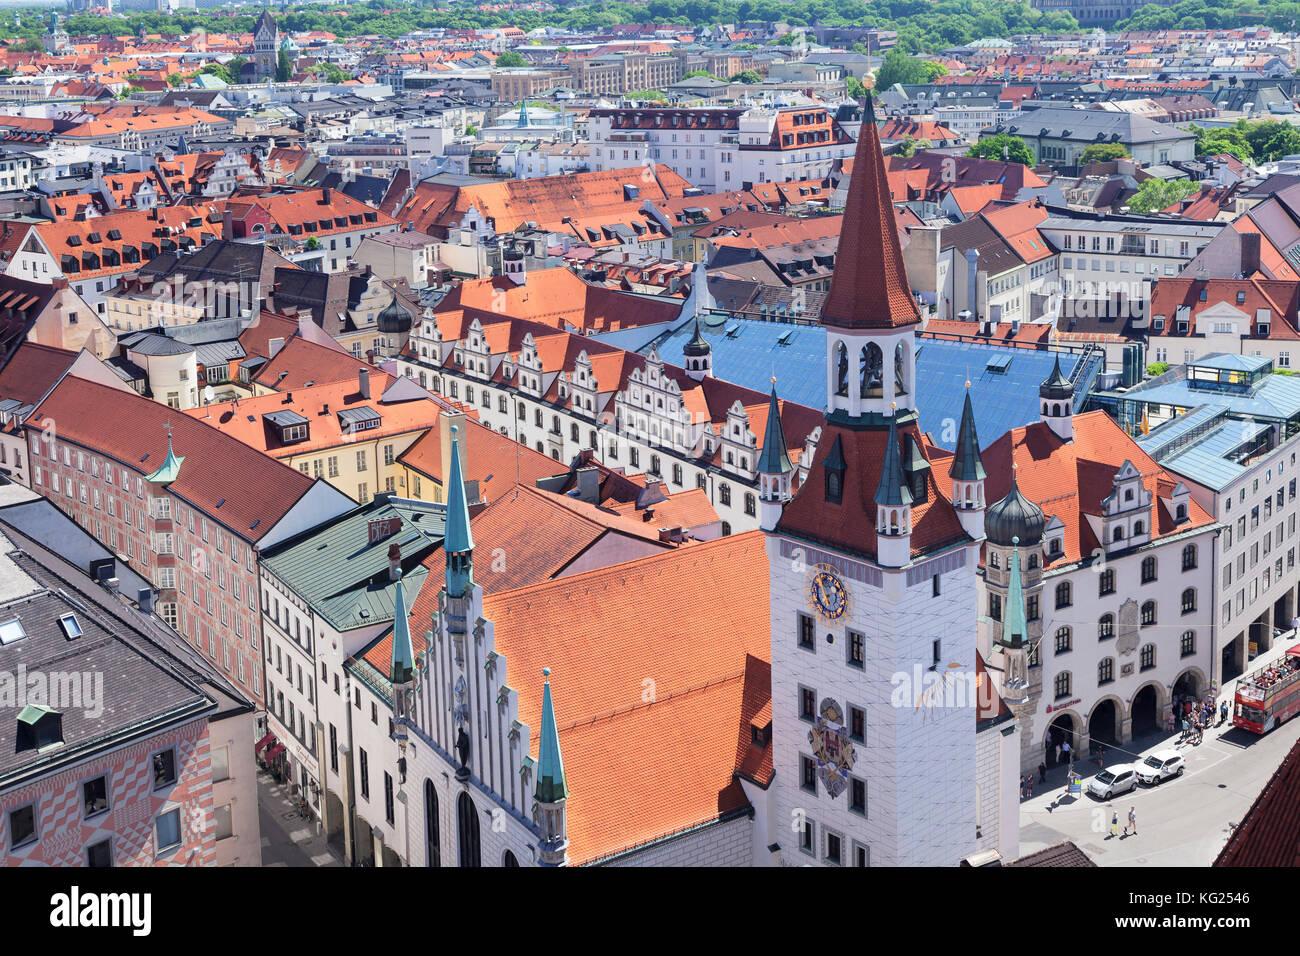 Old town hall (Altes Rathaus) at Marienplatz Square, Munich, Bavaria, Germany, Europe Stock Photo